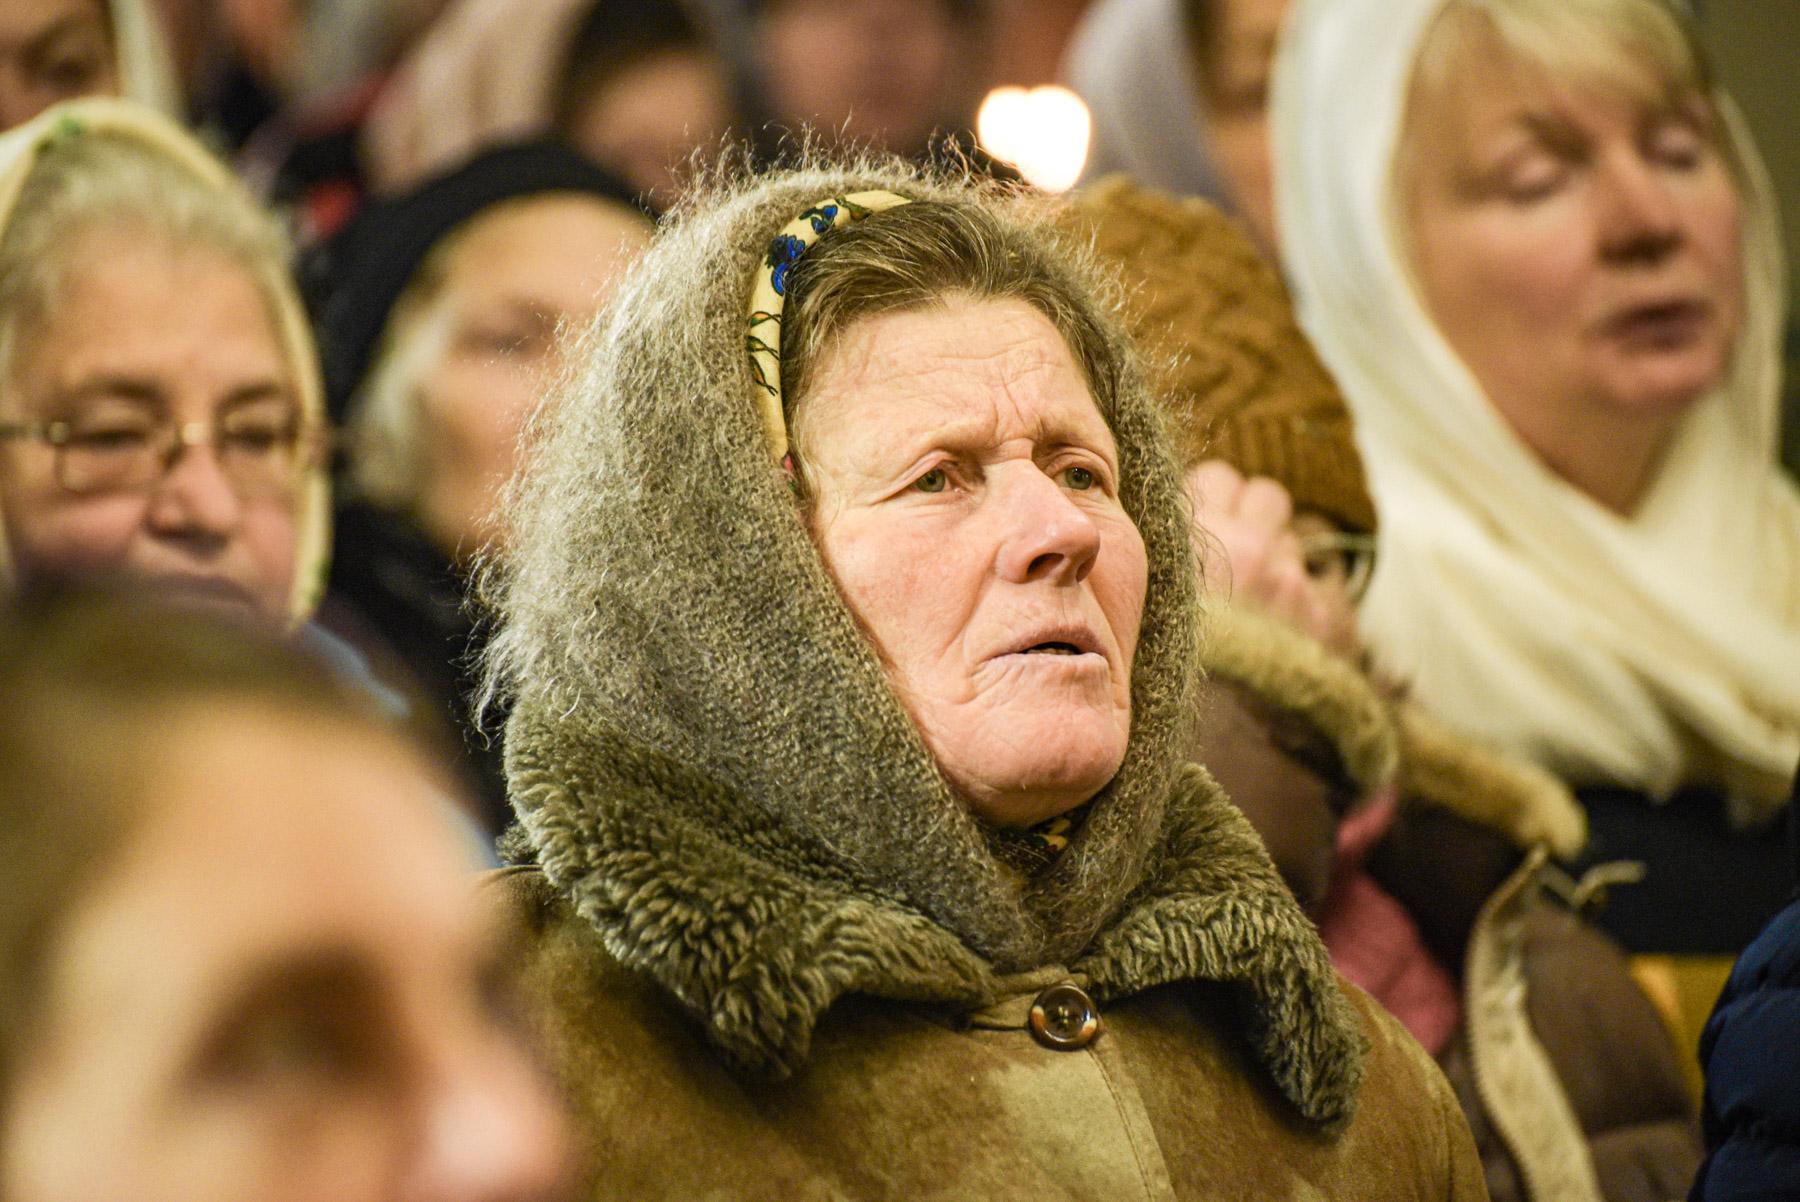 photos of orthodox christmas 0222 2